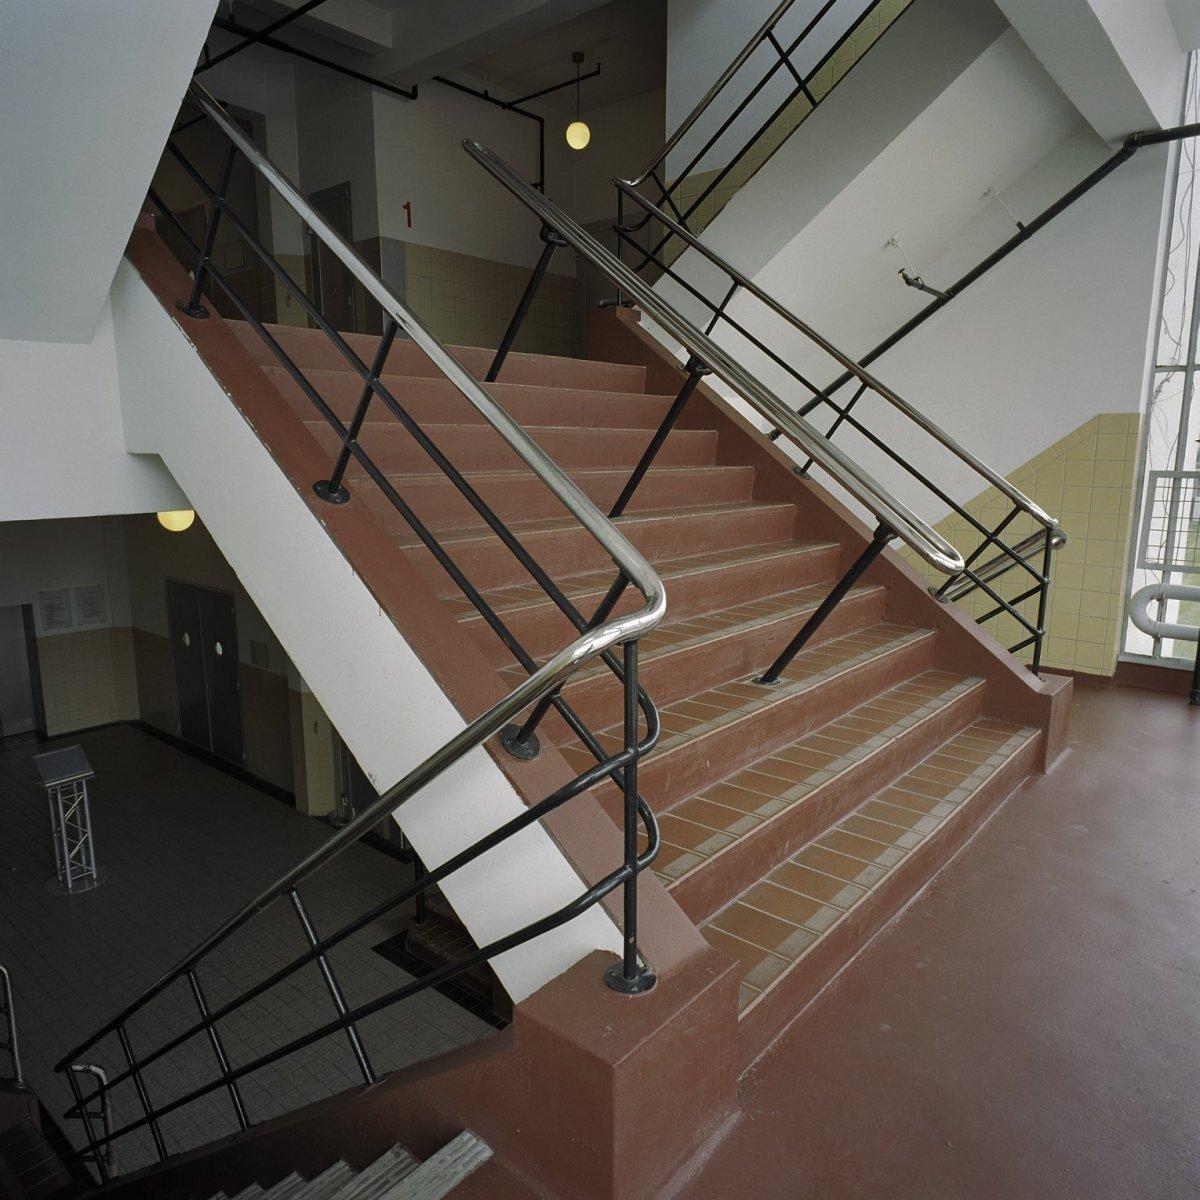 File interieur trappenhuis rotterdam 20373567 rce for Interieur rotterdam